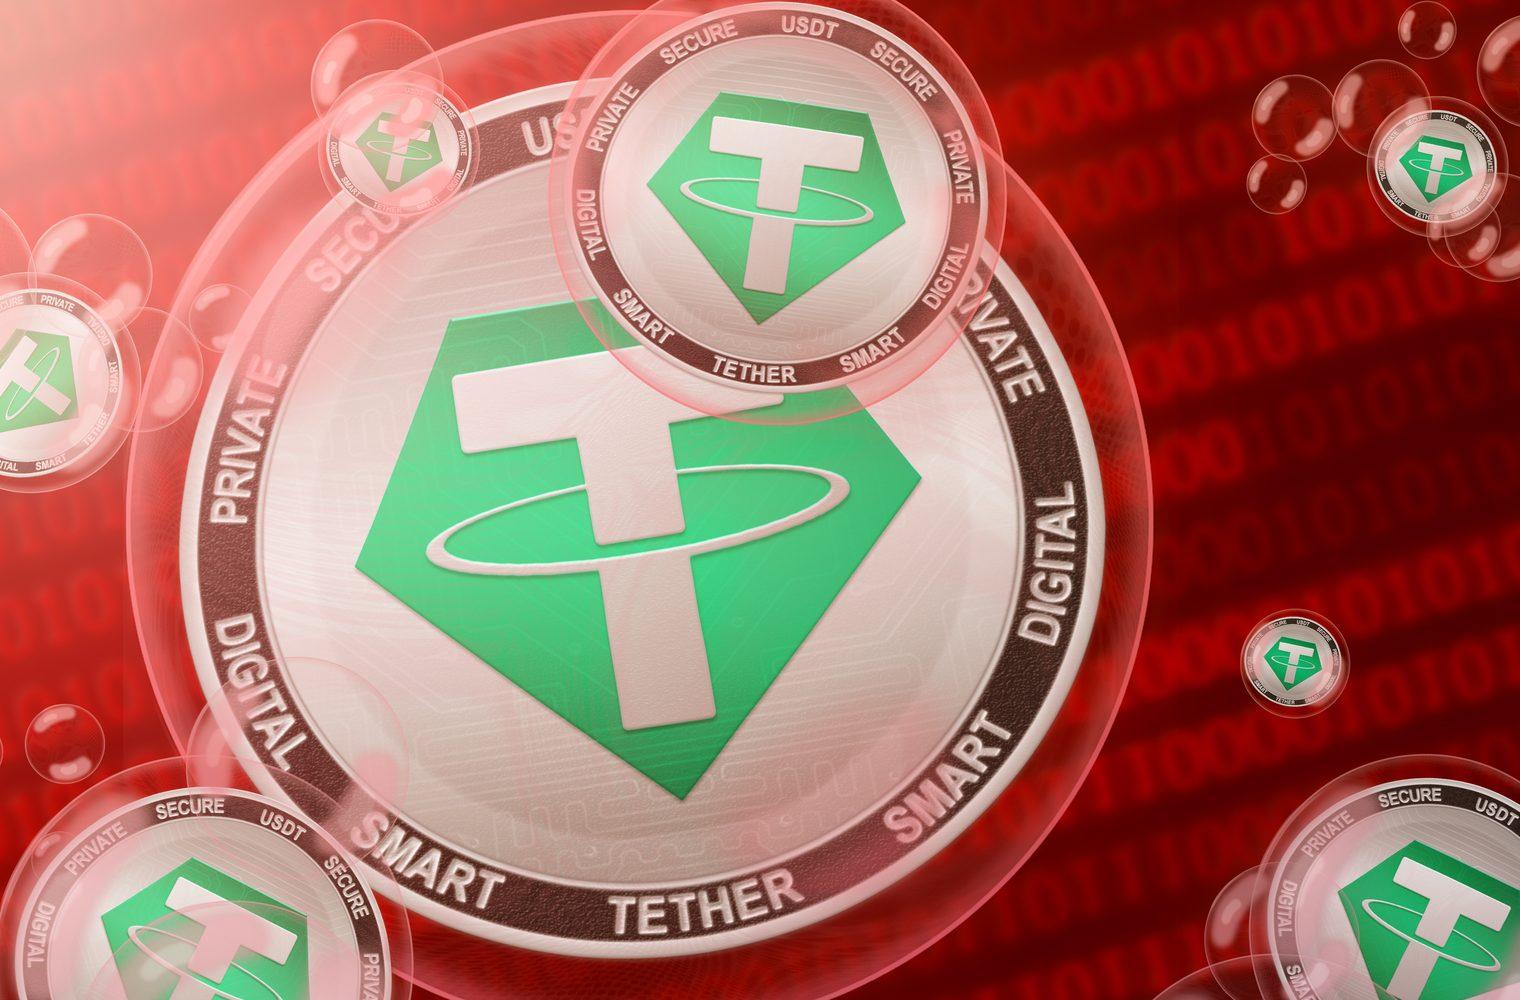 Tether creó la demanda de reclamos de 'La burbuja más grande en la historia humana' contra Bitfinex